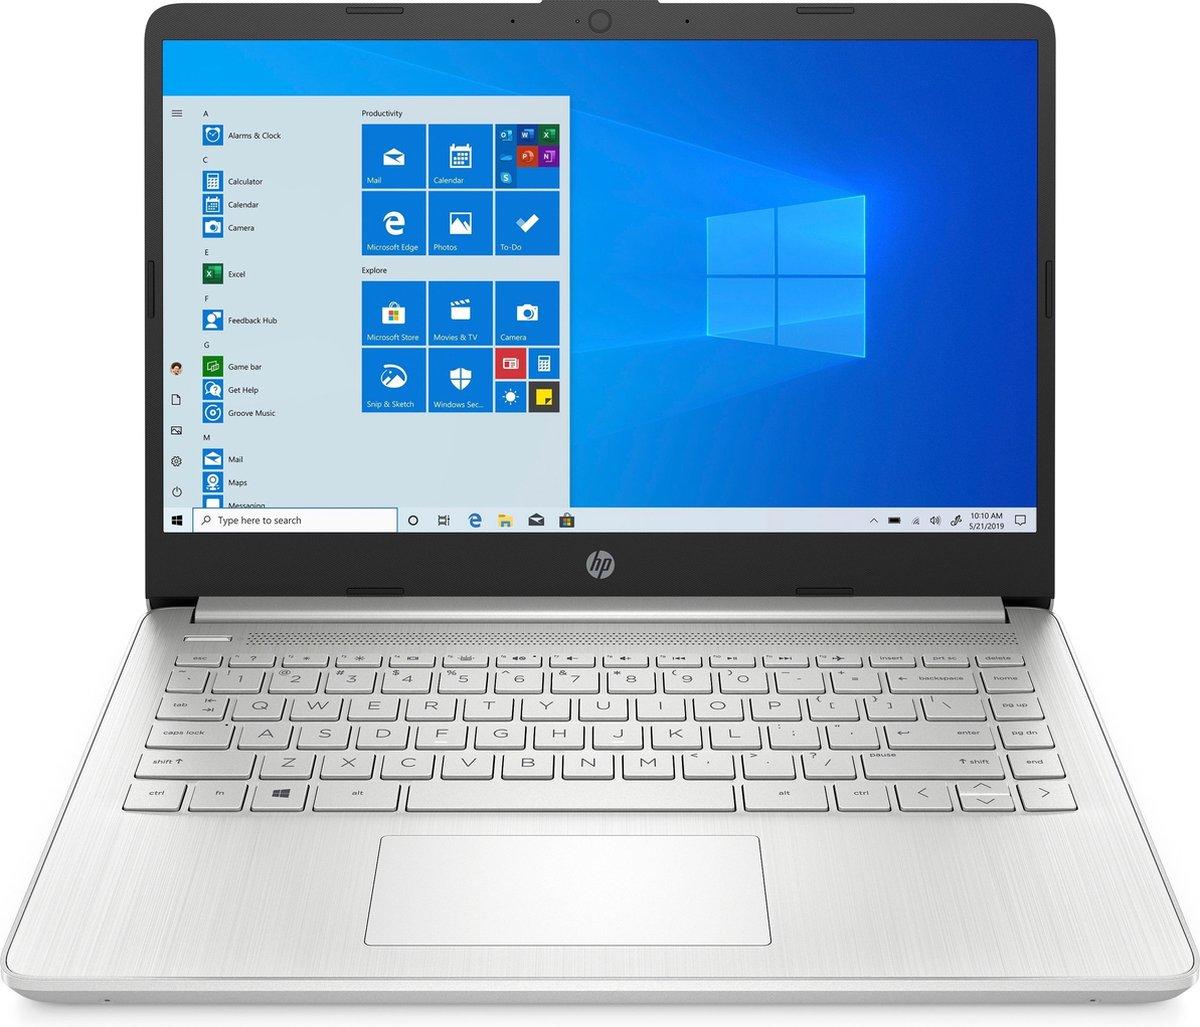 "HP 14s-dq2130nd DDR4-SDRAM Notebook 35,6 cm (14"") 1920 x 1080 Pixels Intel® 11de generatie Core™ i5 8 GB 512 GB SSD Wi-Fi 5 (802.11ac) Windows 10 Home Zilver"